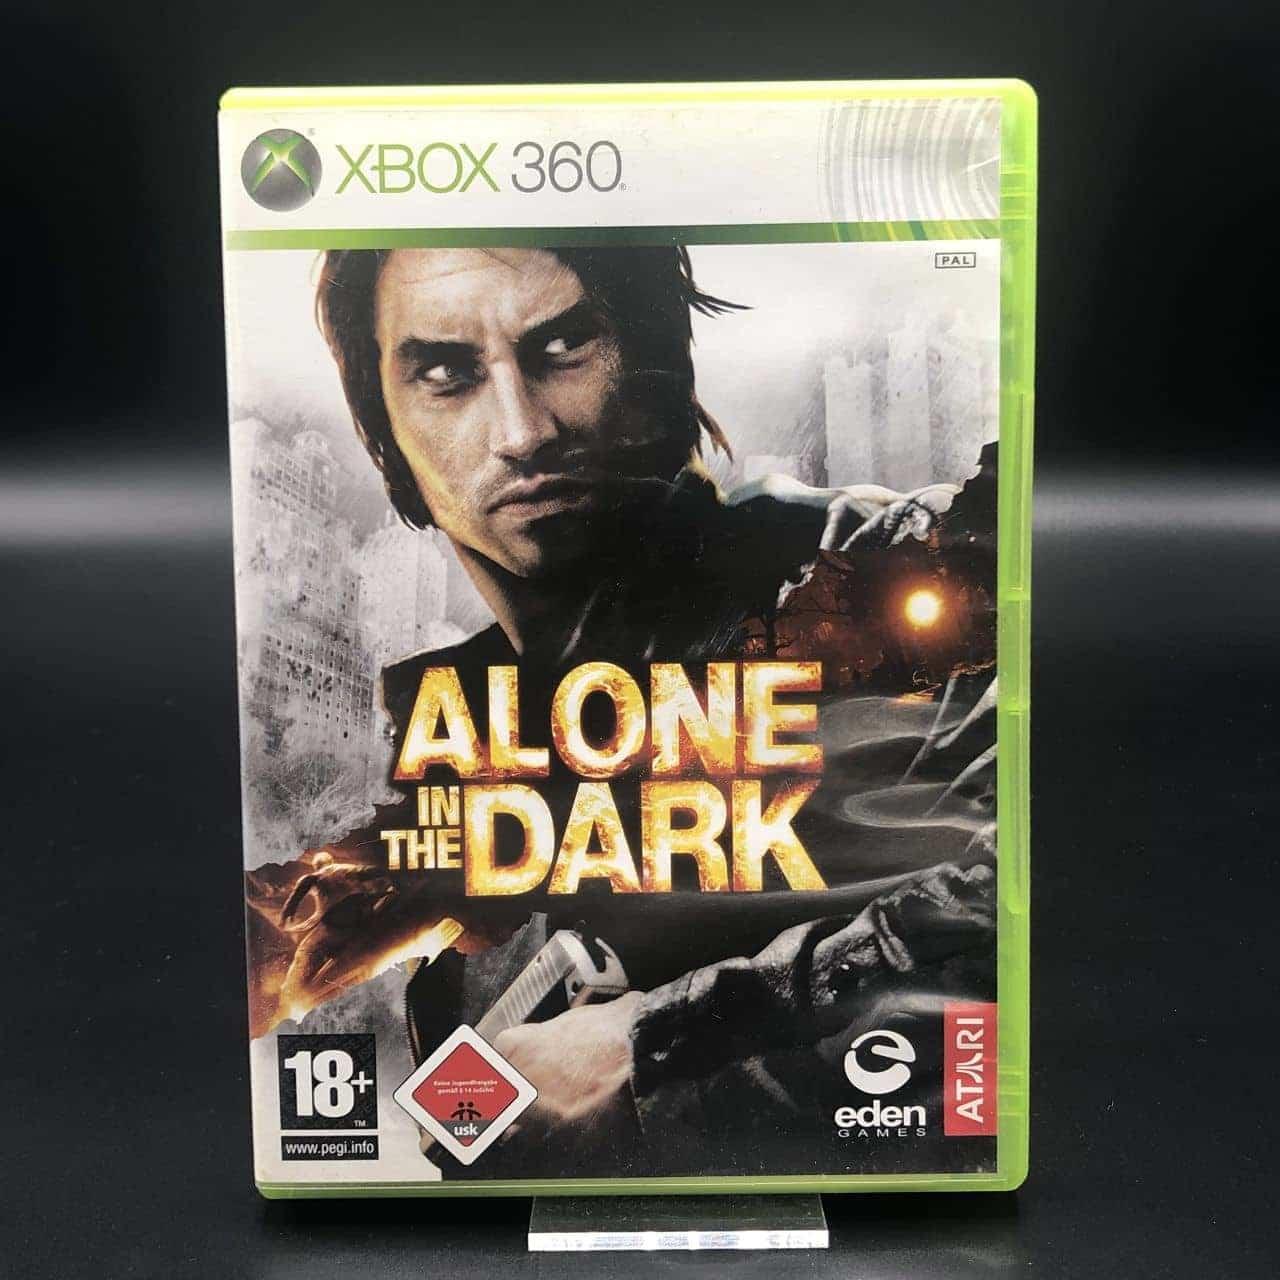 Alone in the Dark (Komplett) (Sehr gut) XBOX 360 (FSK18)